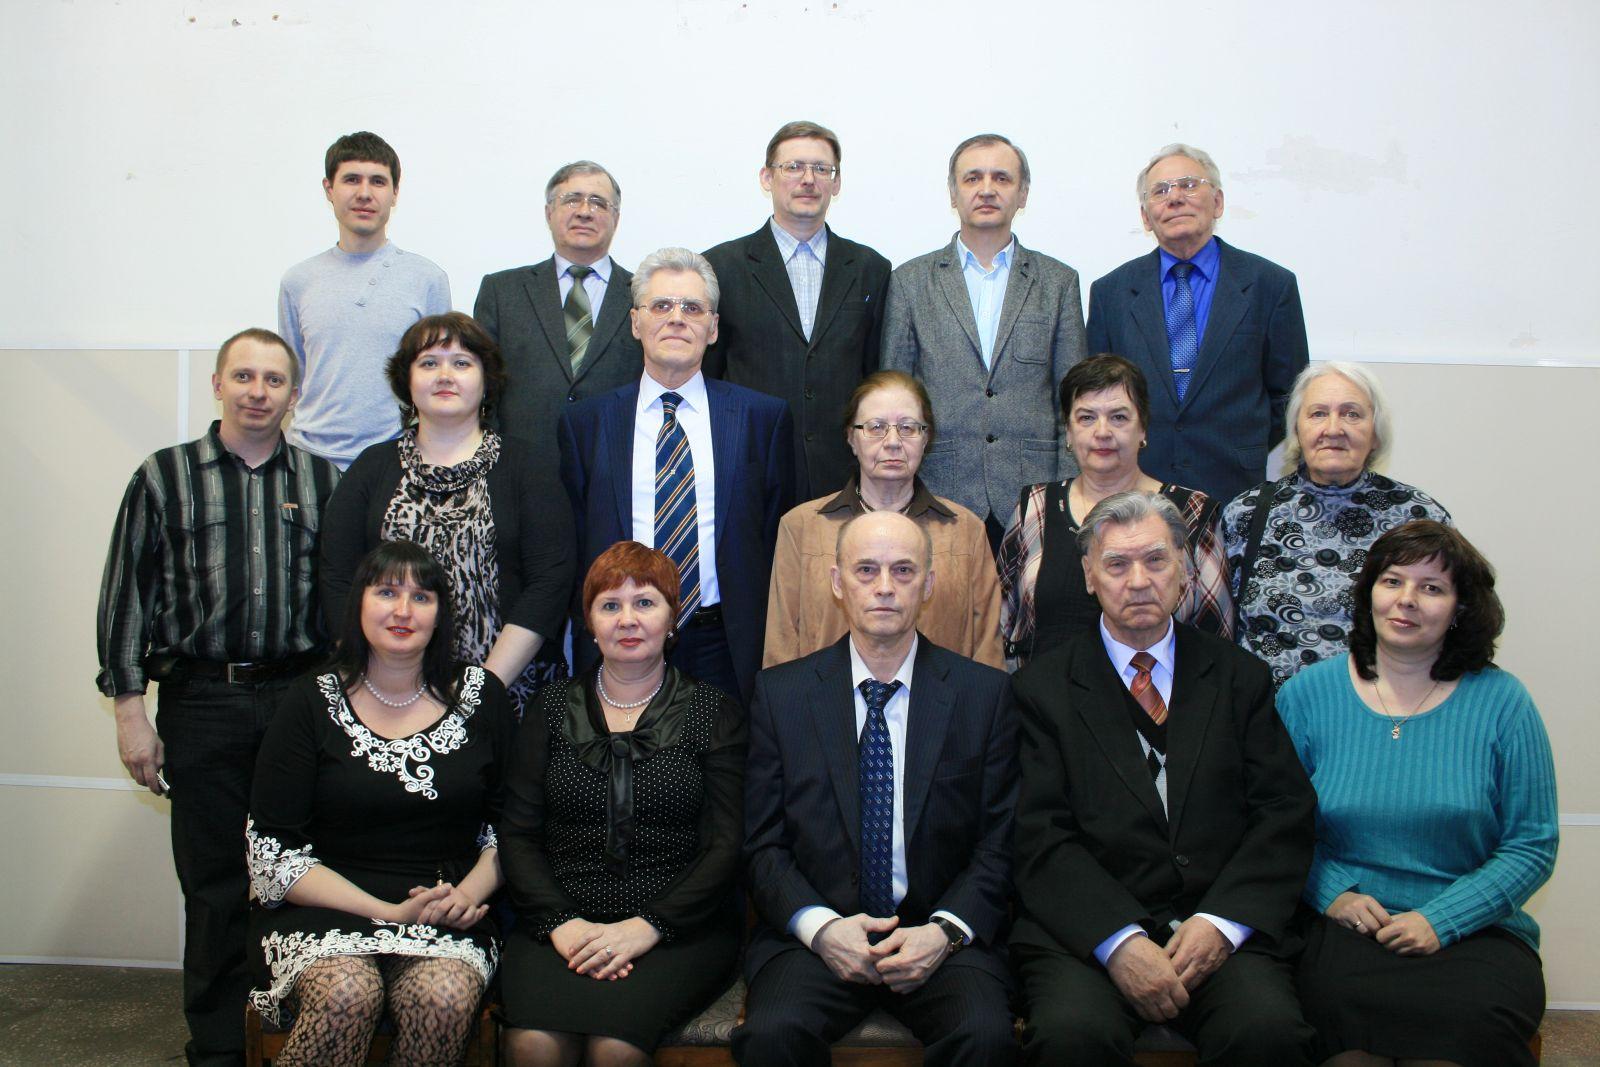 работа для граждан украины а москве